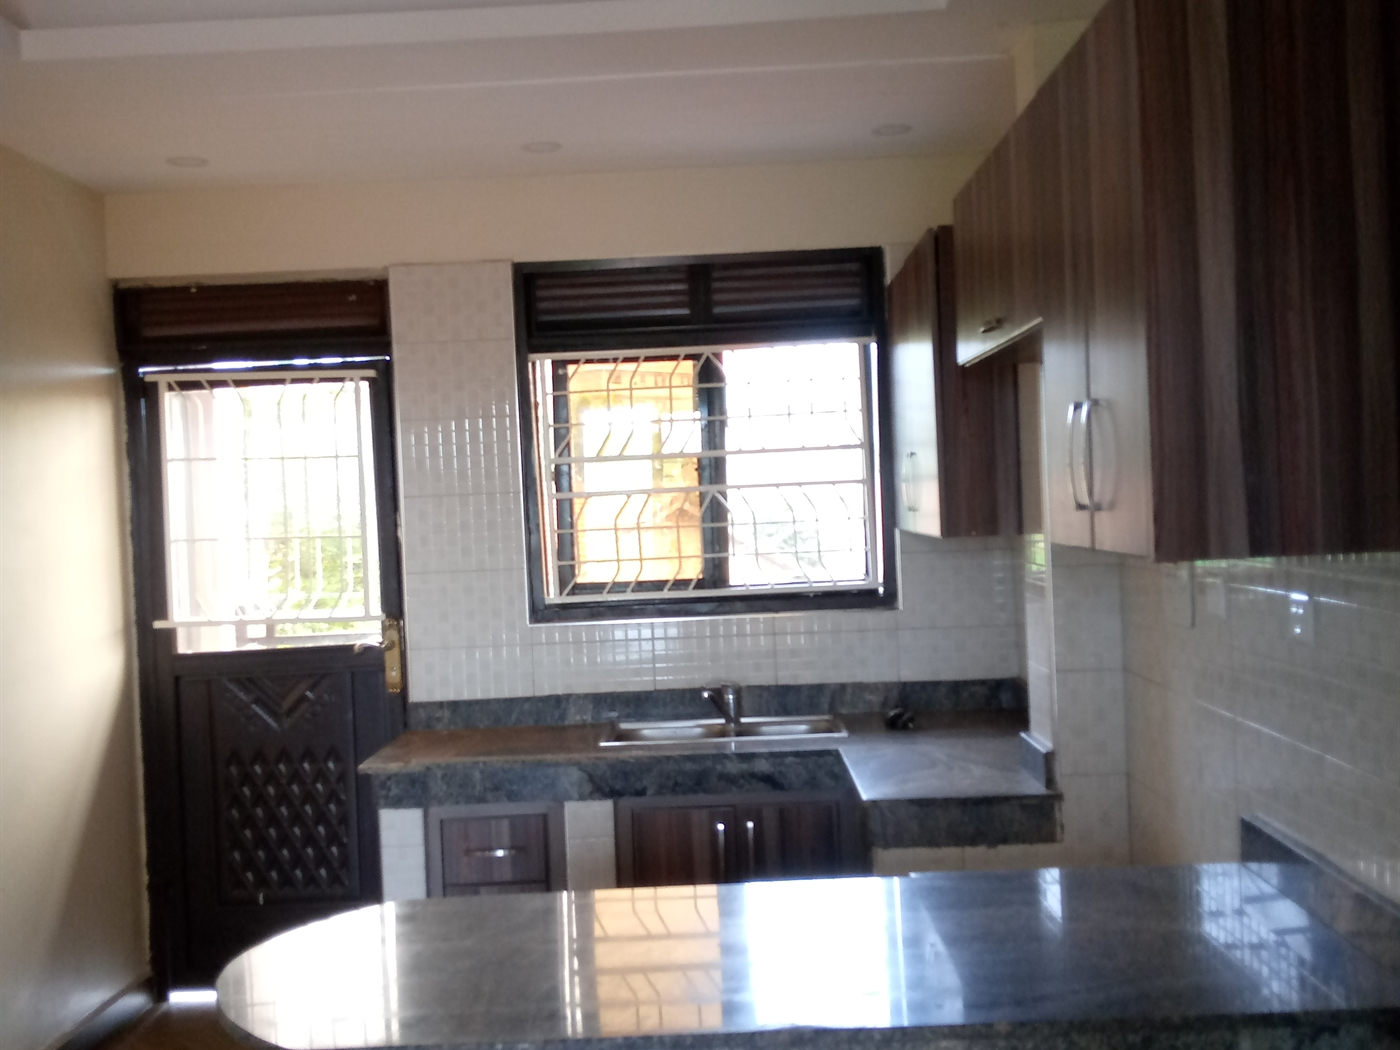 Apartment for rent in Namuwongo Kampala